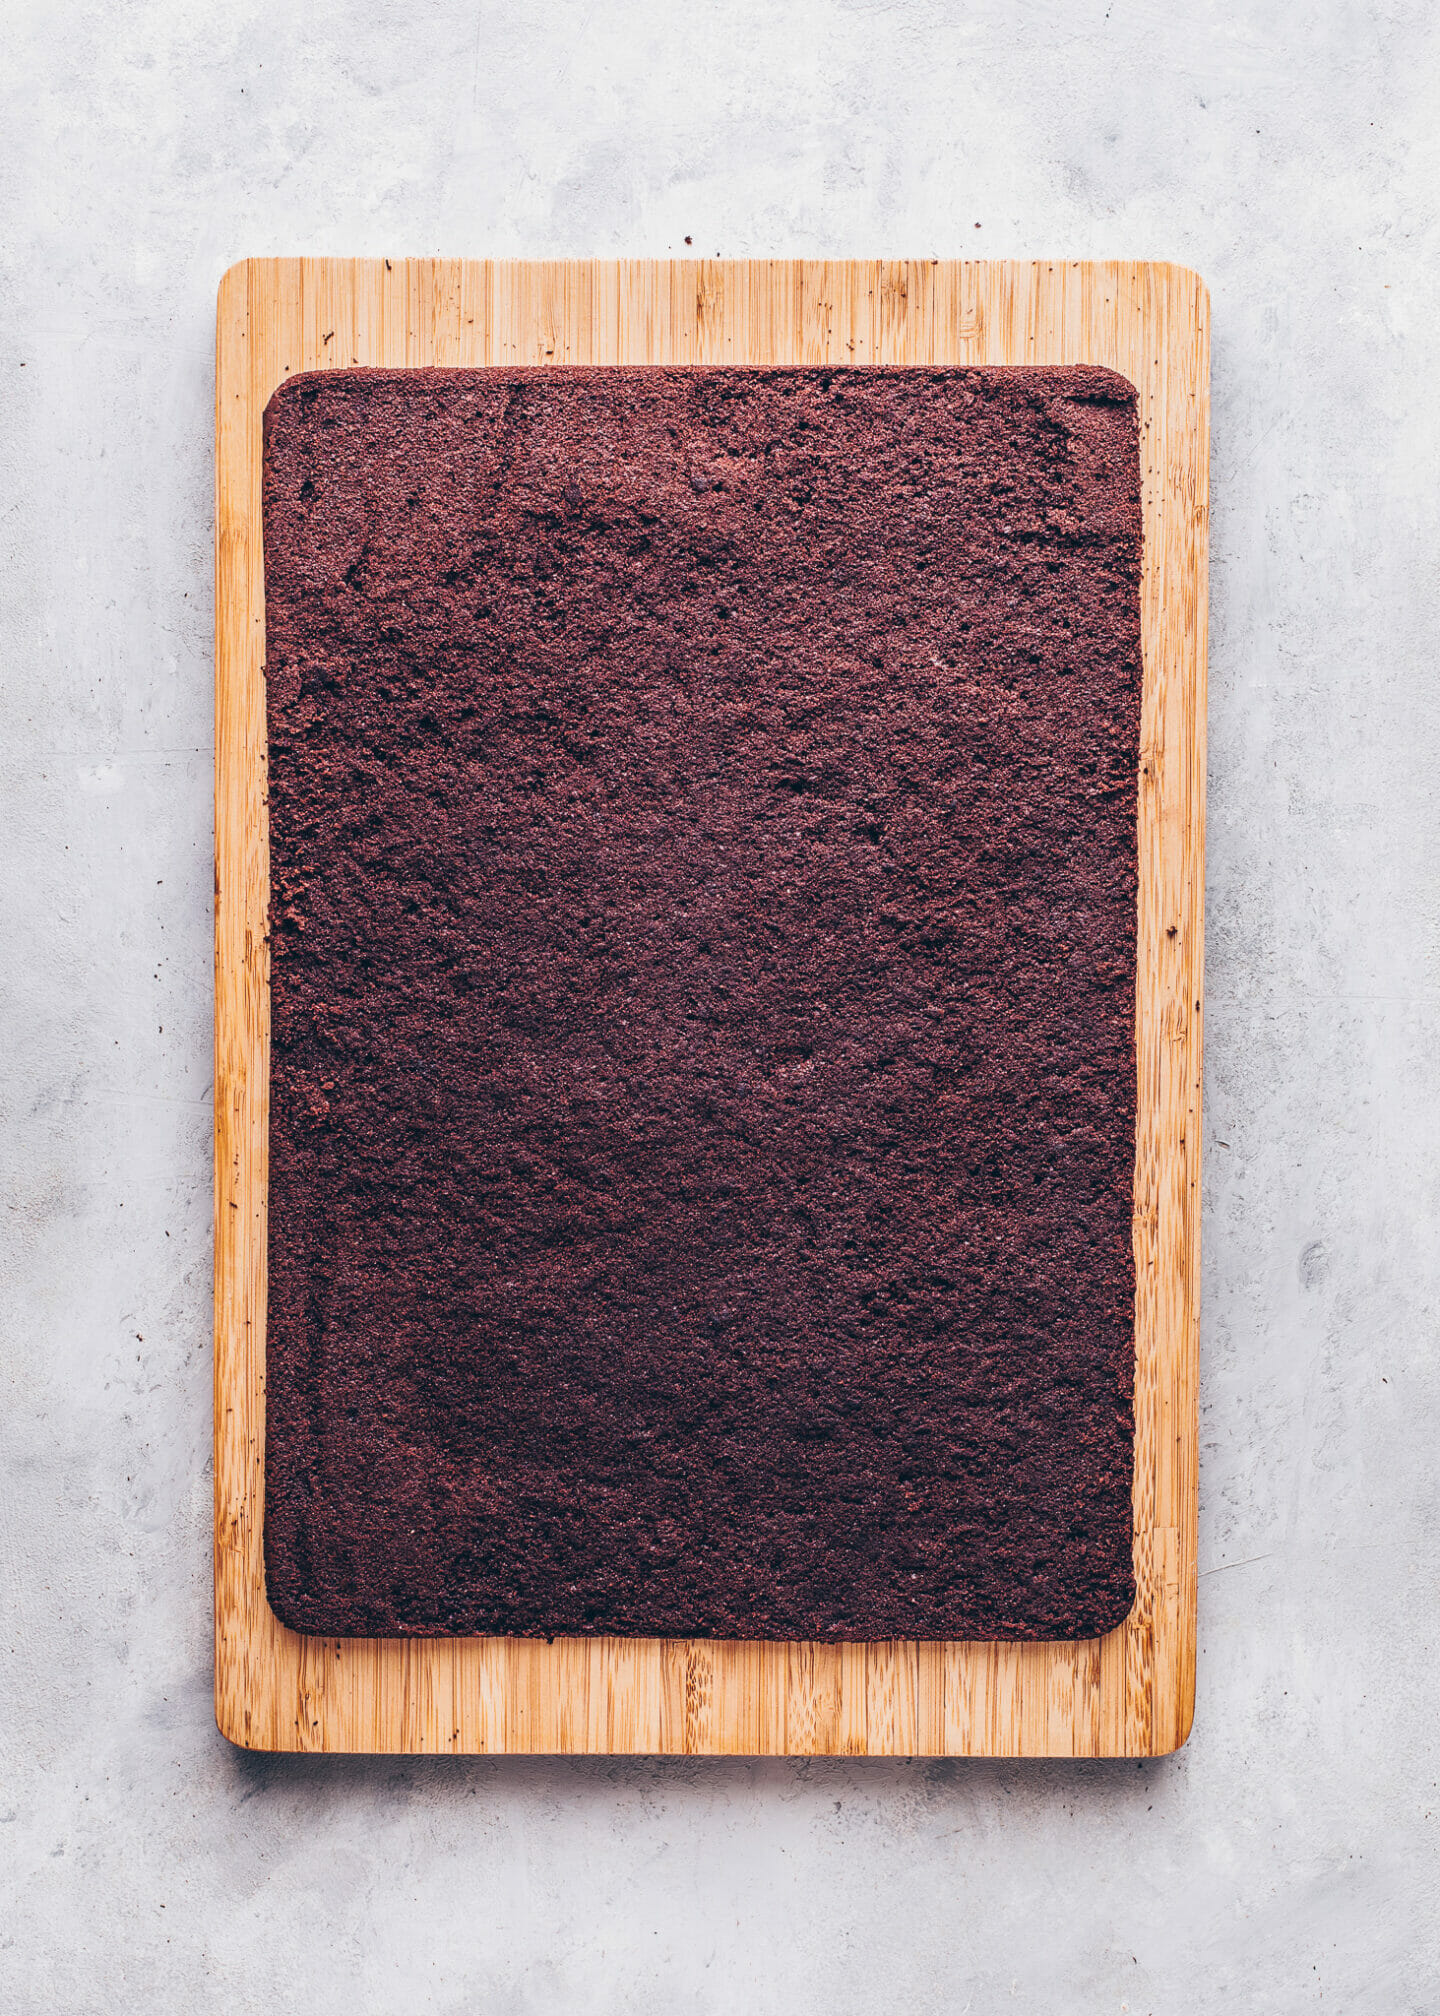 vegan chocolate sponge cake